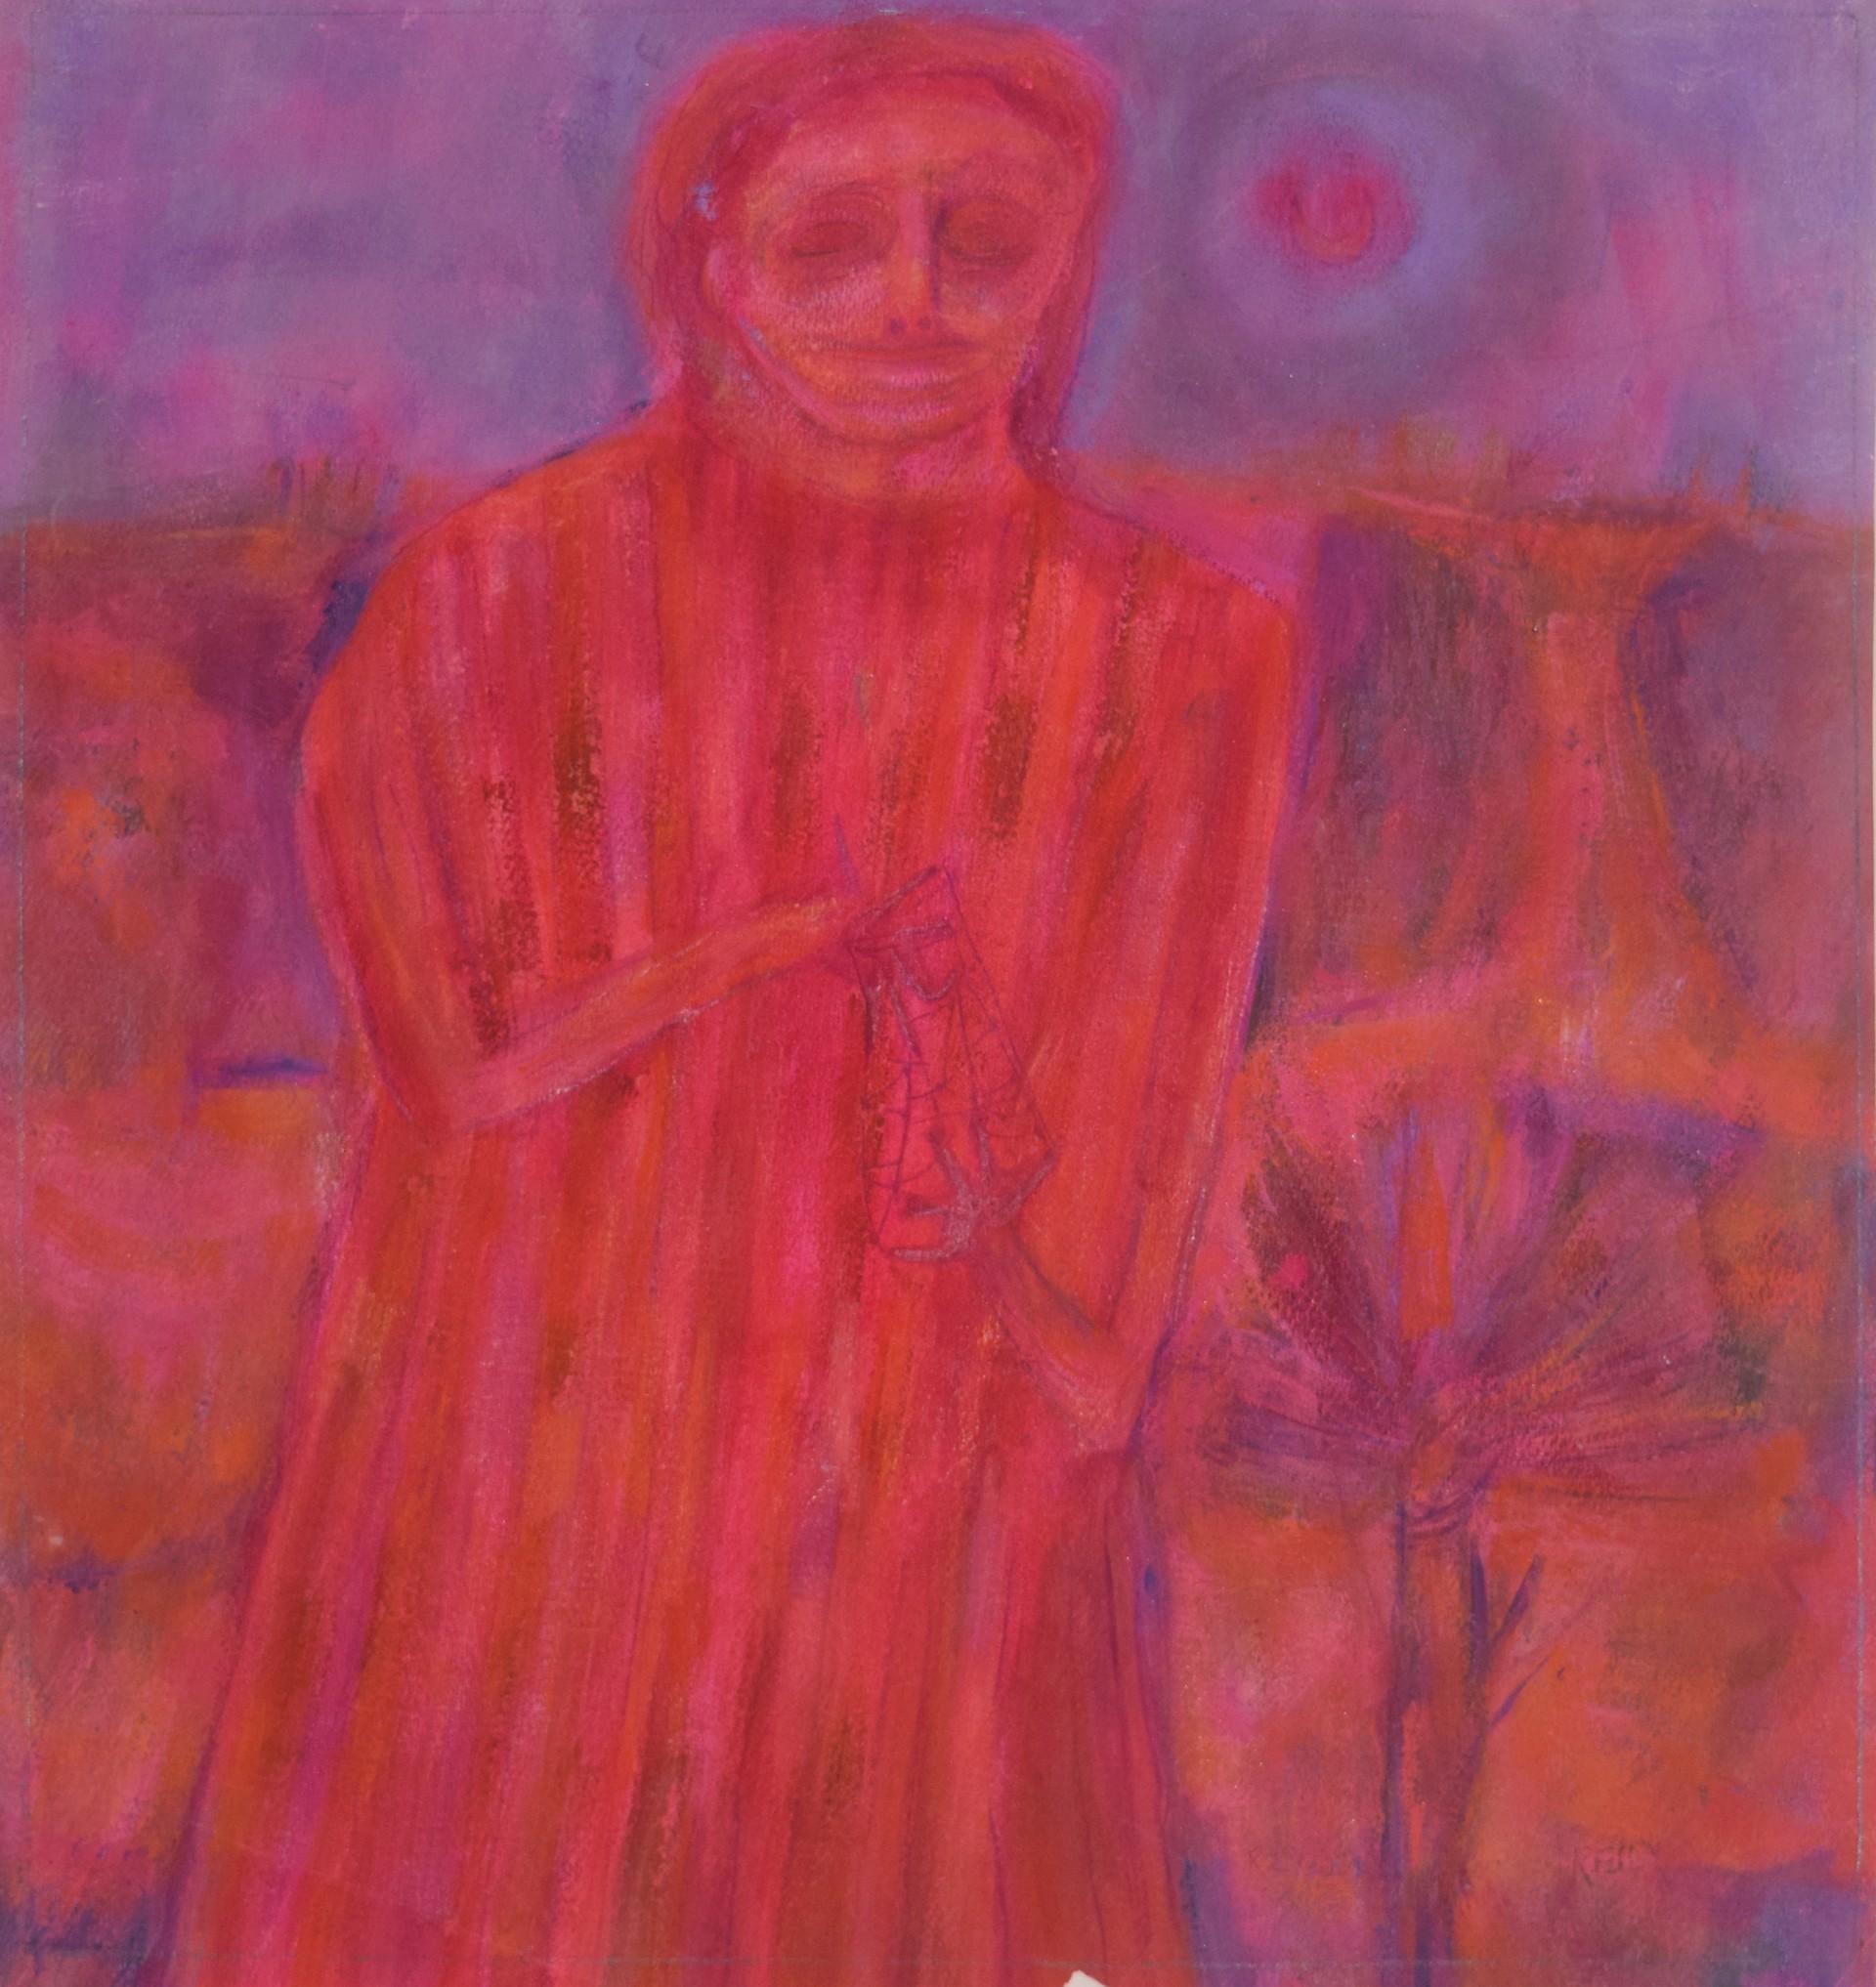 Girl in Red by Bill Reily